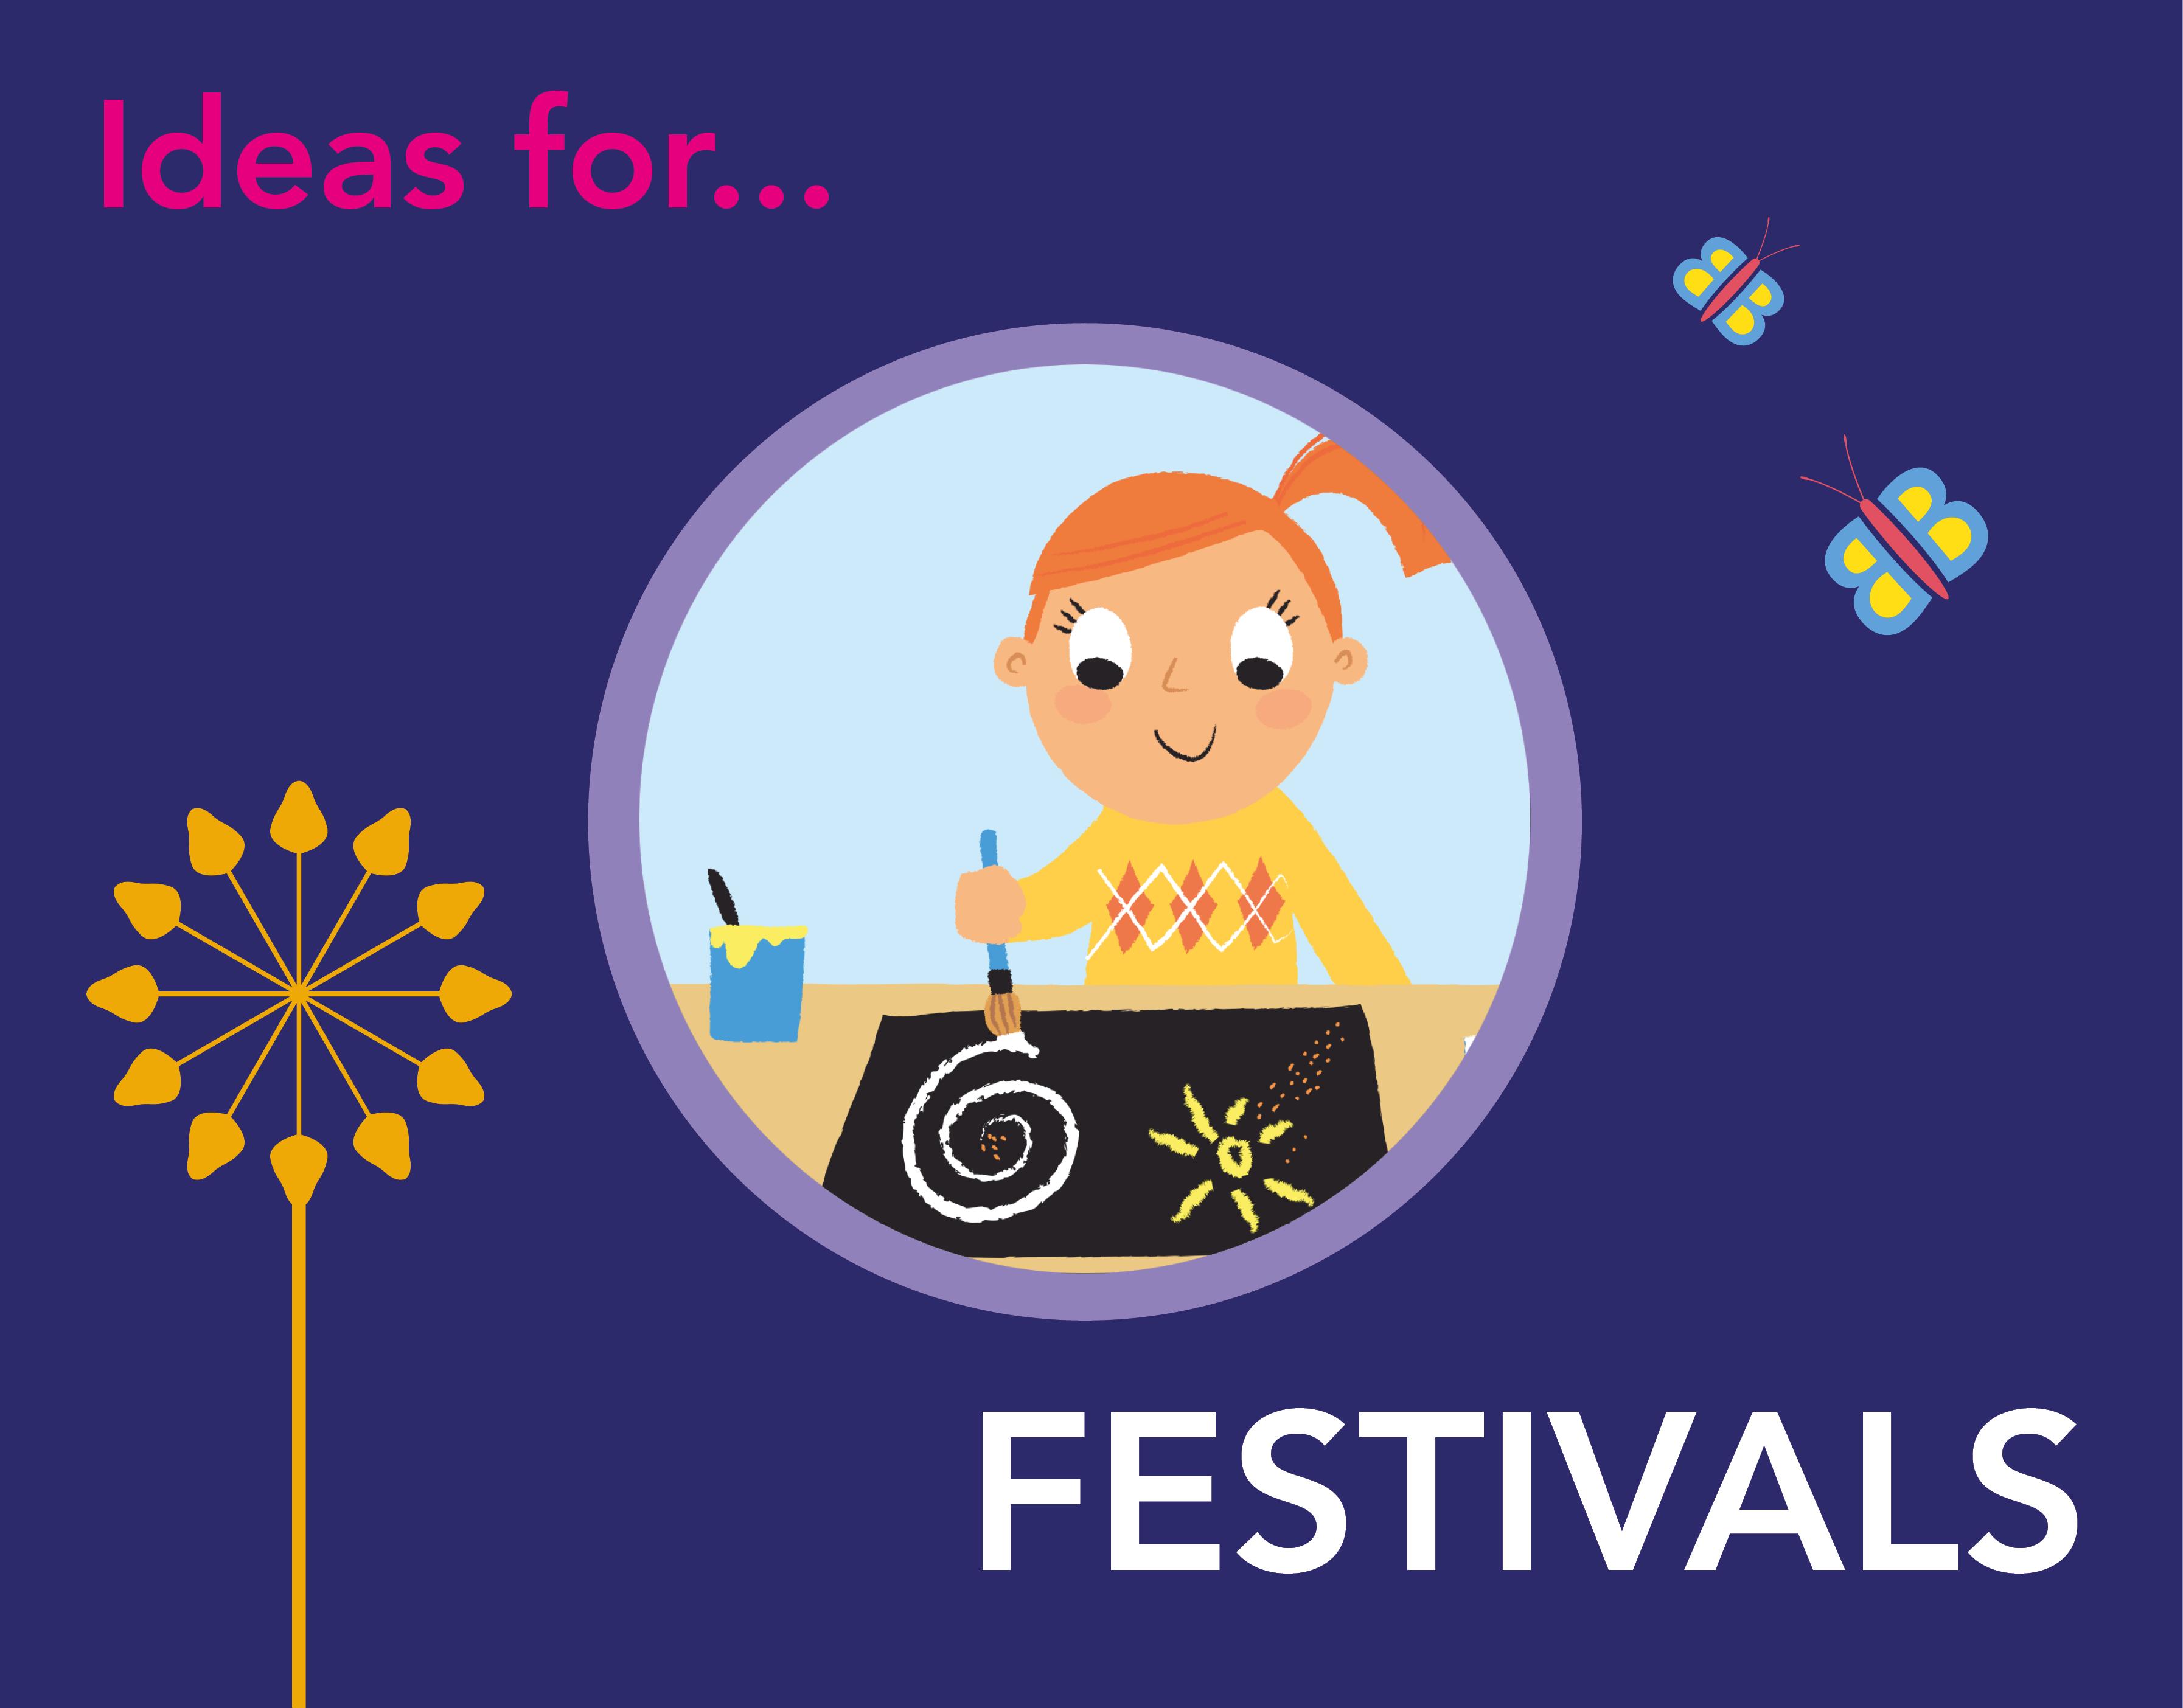 Ideas for Festivals